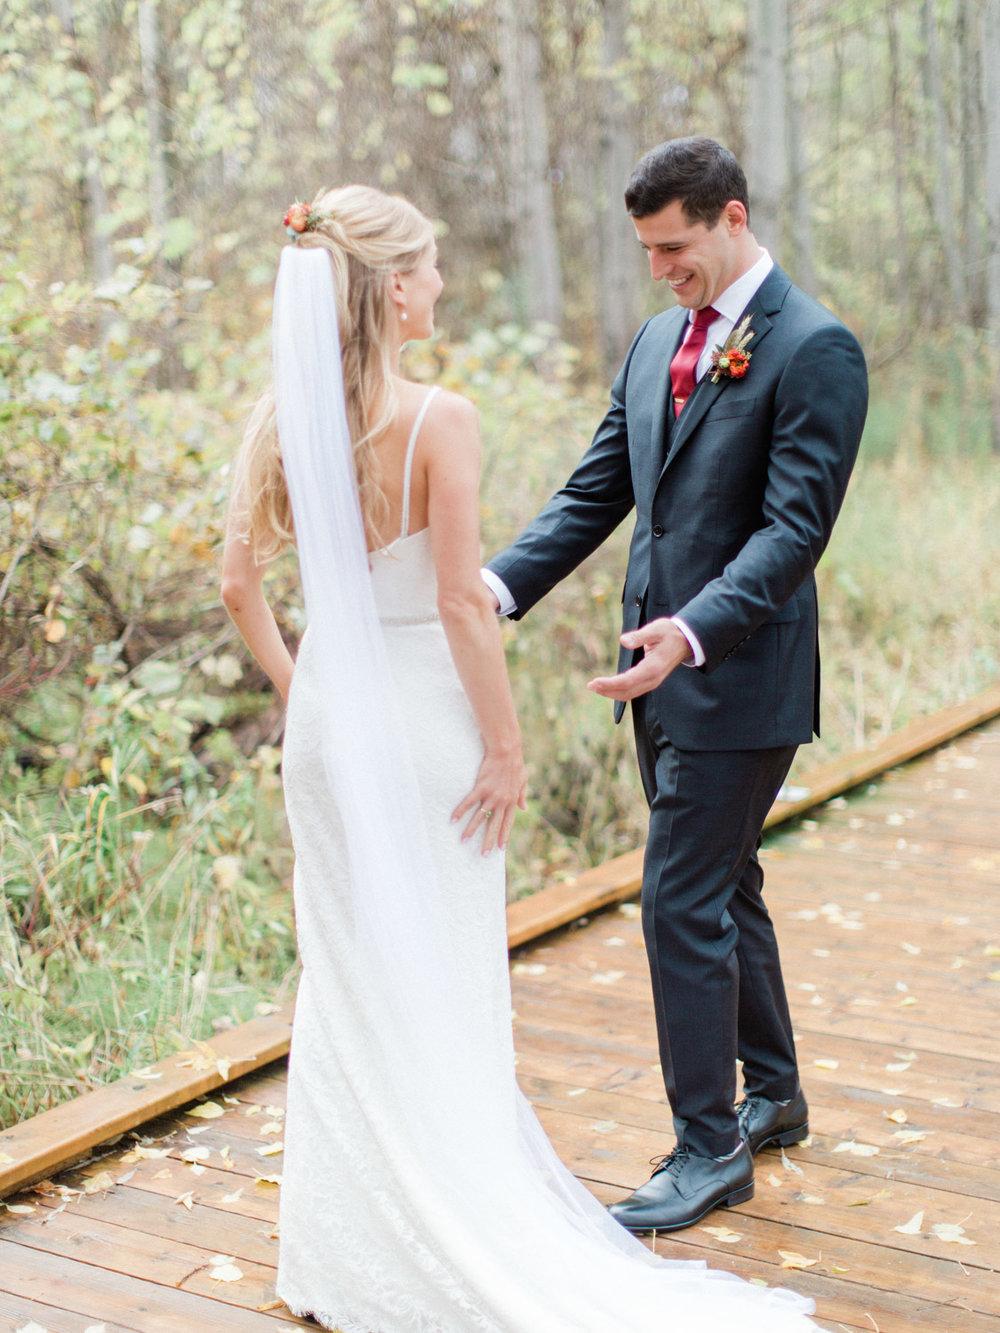 Toronto-Collingwood-Muskoka-Wedding-photographer-planning-first-look6.jpg